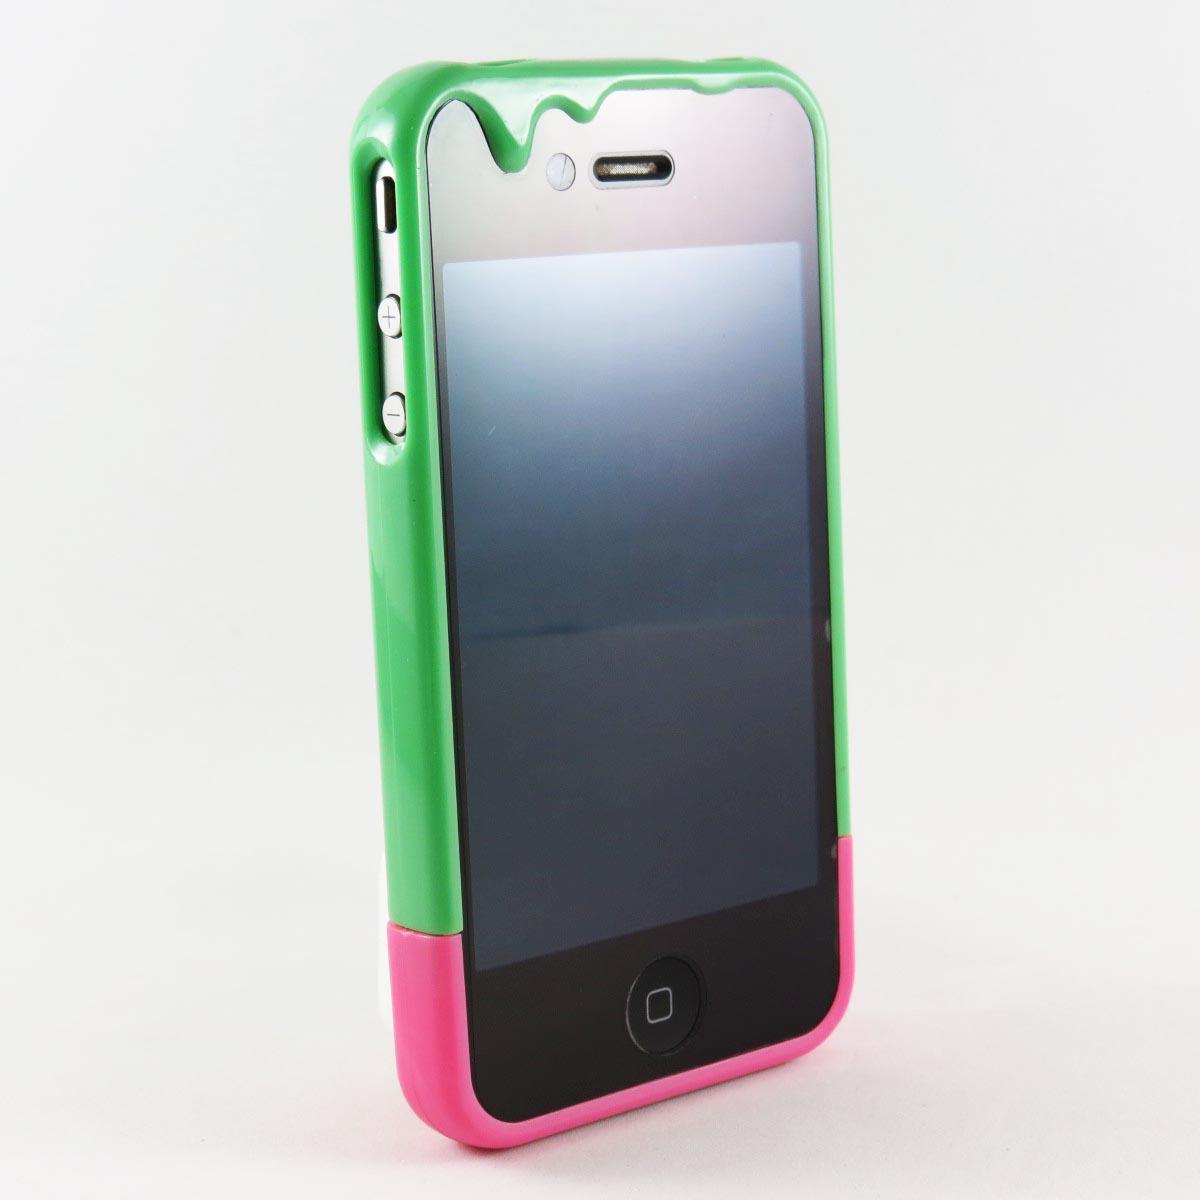 Capa iPhone 4 / 4s - Sorvete / Doce - Verde e Rosa